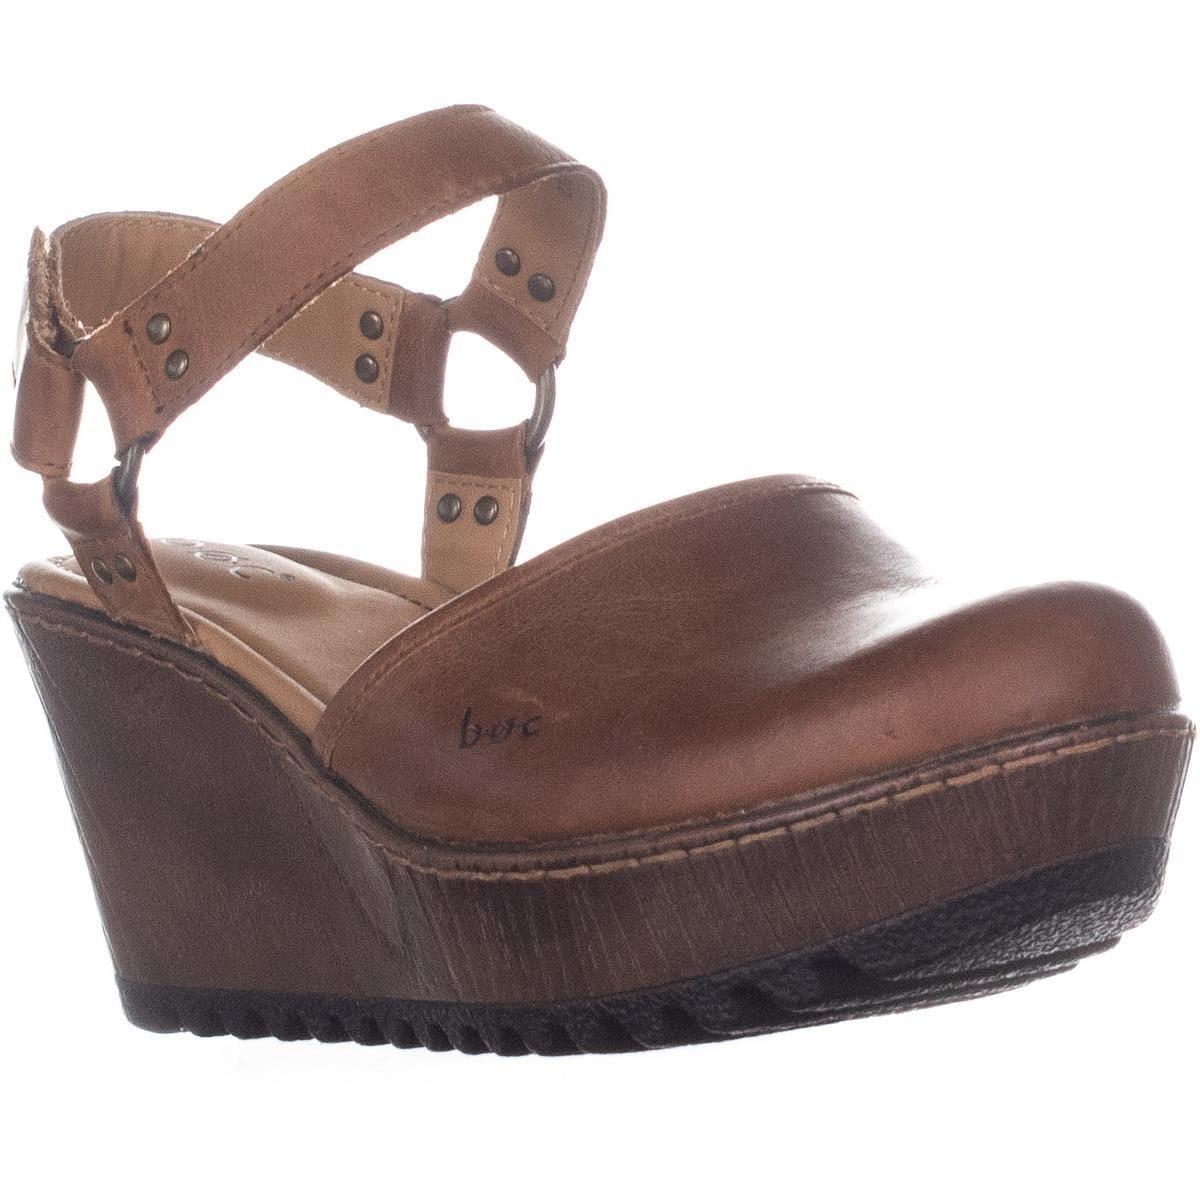 640faade0d1f Shop B.O.C Born Rina Wedge Ankle Strap Sandals